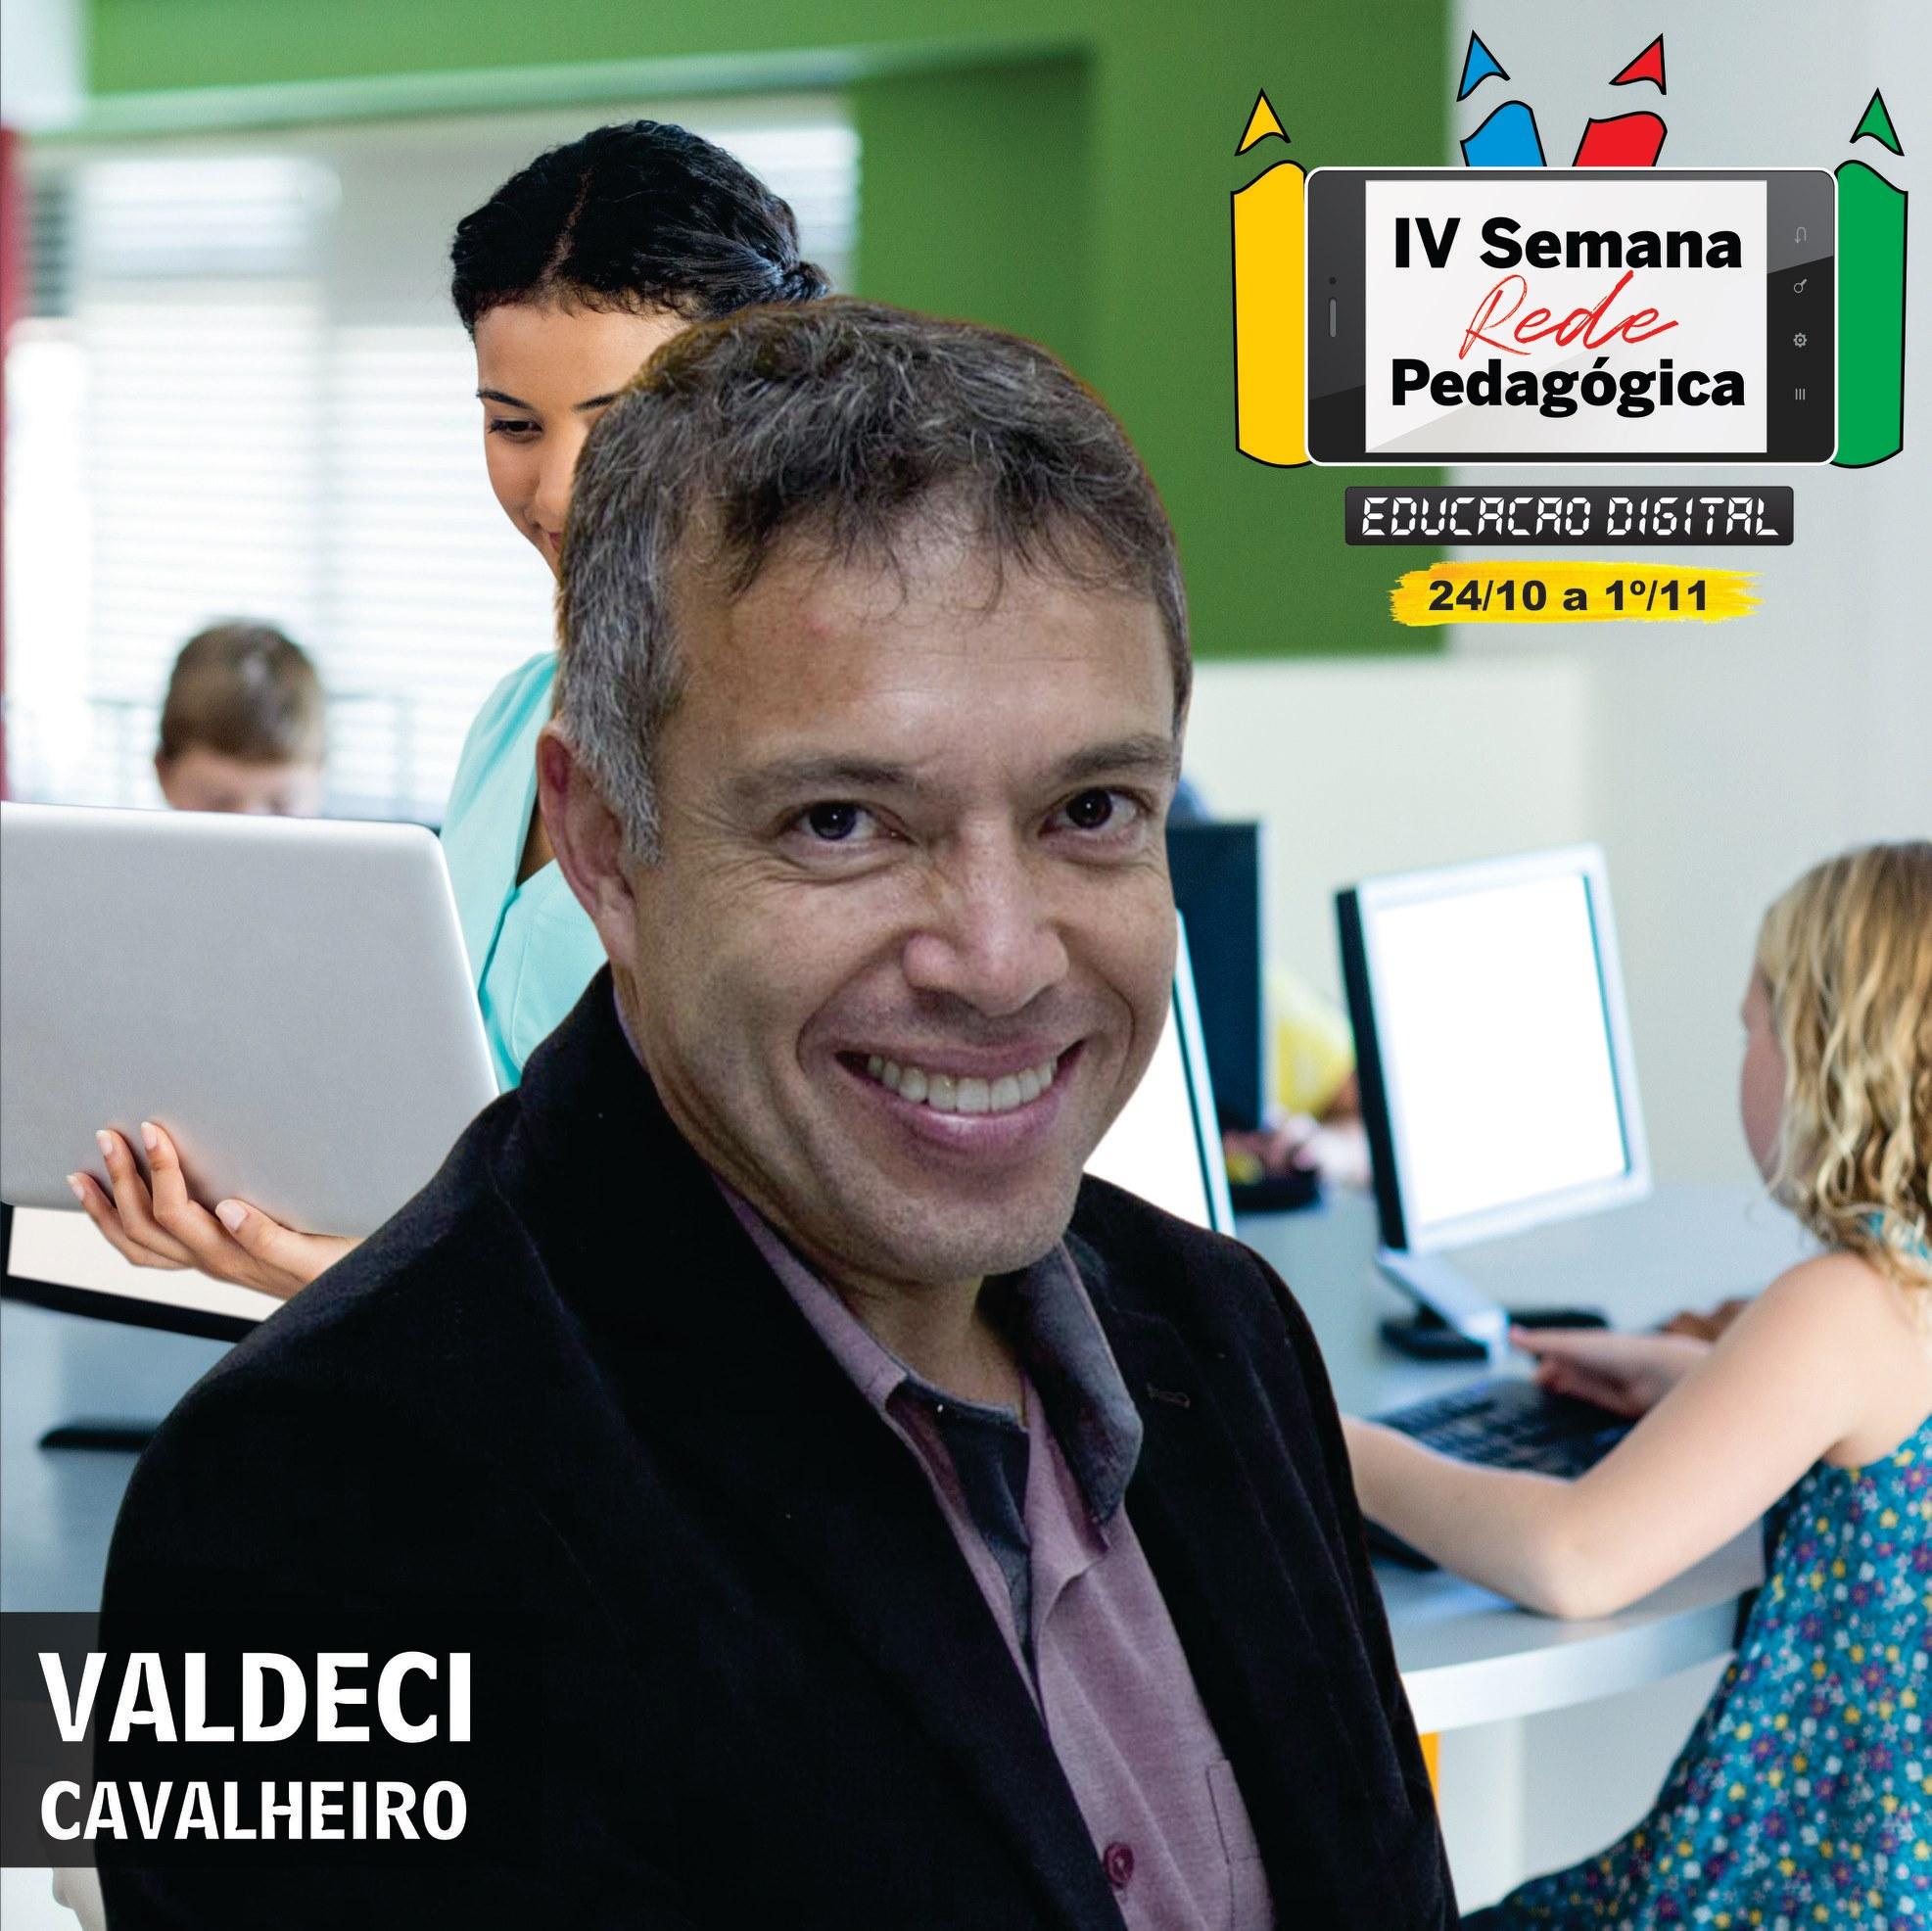 Feed-Valdeci-Cavalheiro_01-11-2020_geral